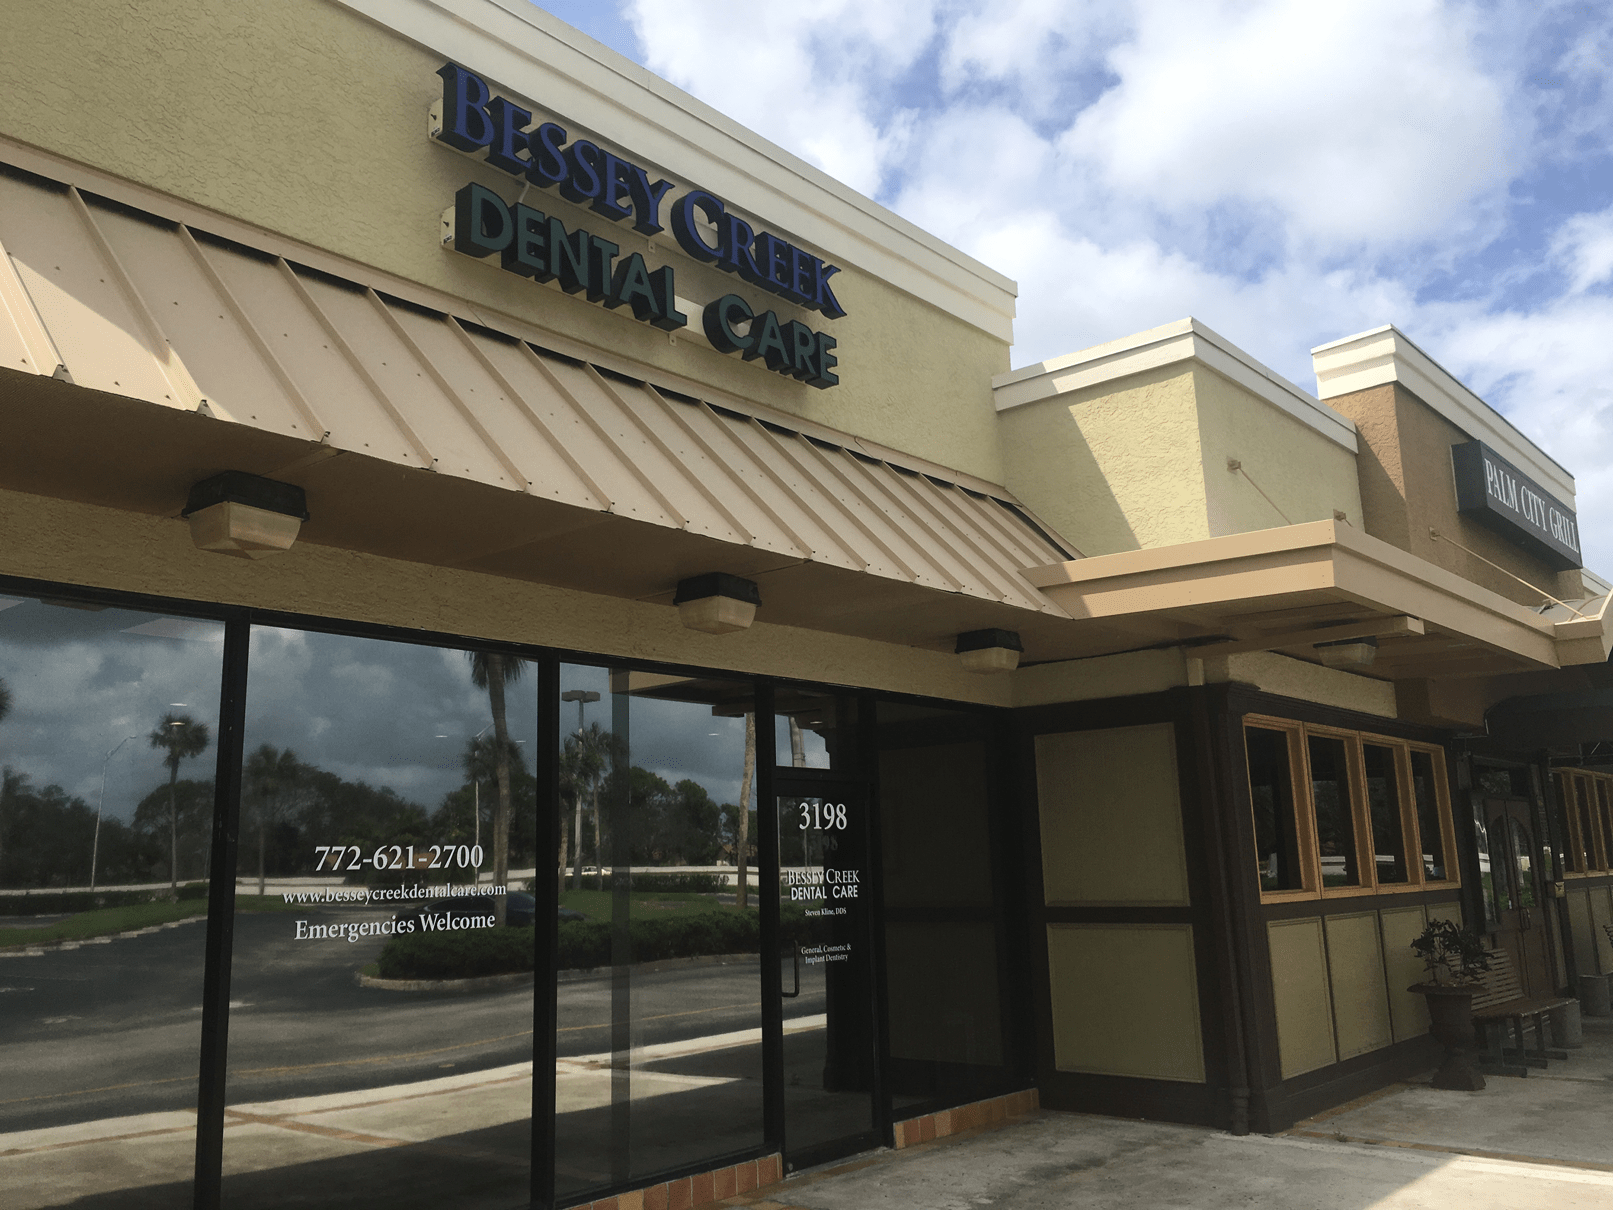 Bessey Creek Dental Care Office Placeholder | Dr. Steven Kline, Palm City Dentist serving Palm City, Martin Downs, Stuart, Port St. Lucie, Port Salerno and Martin County.